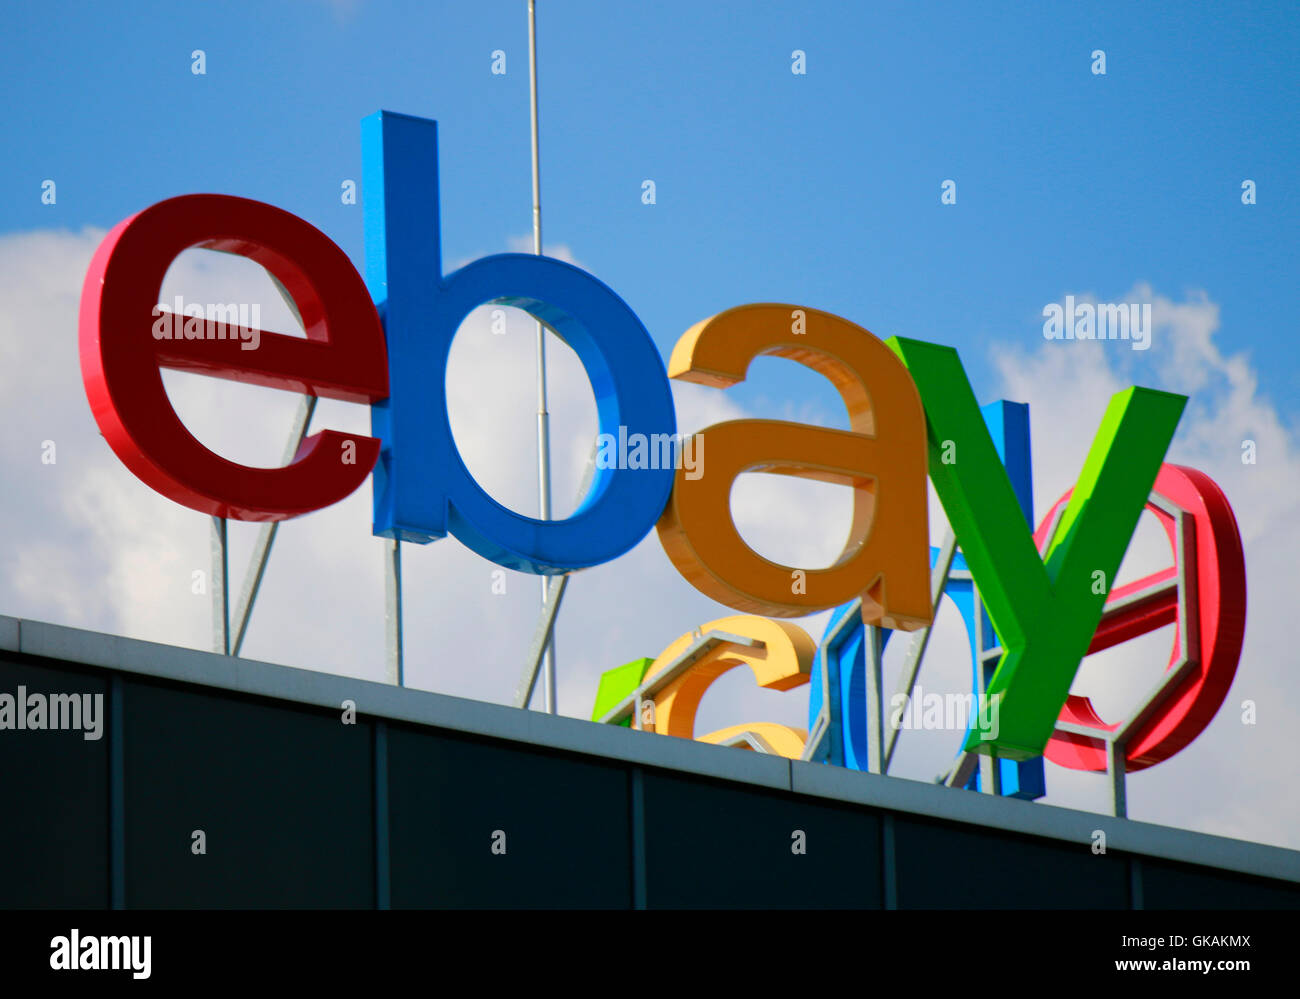 Logo der Marke 'EBay', Berlin. - Stock Image